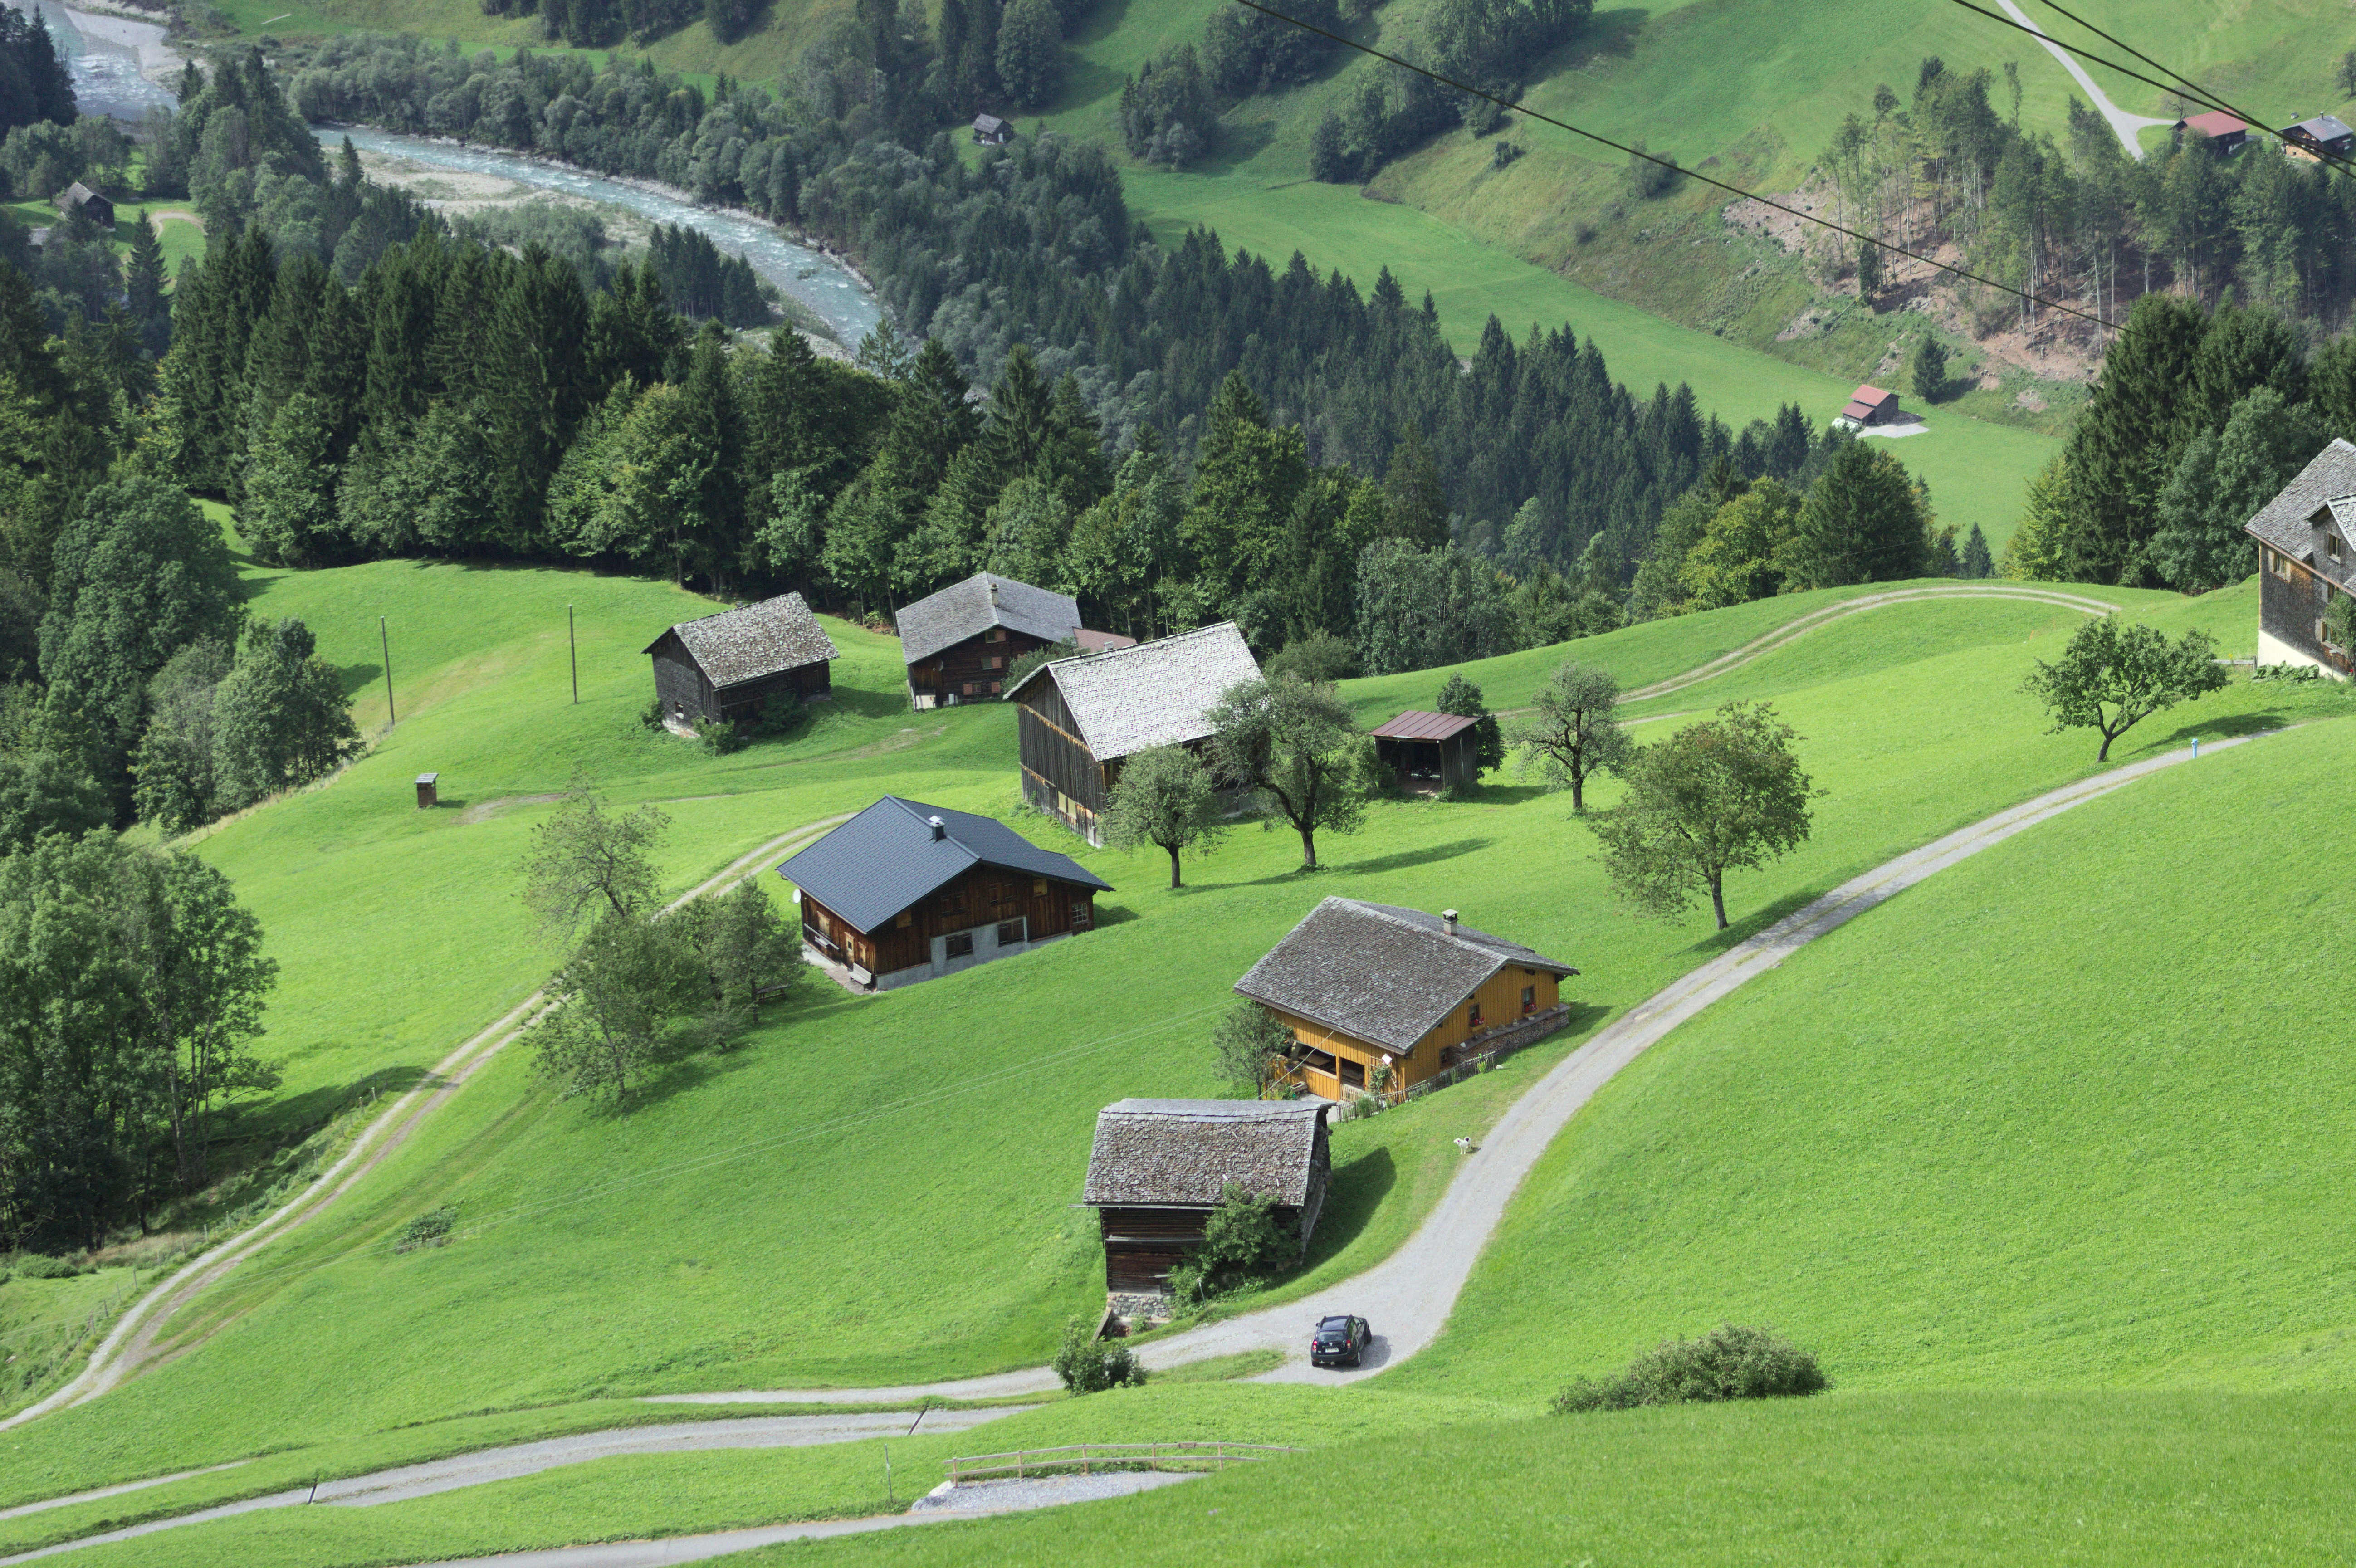 Hillside seen from cable car, sonntag, austria photo